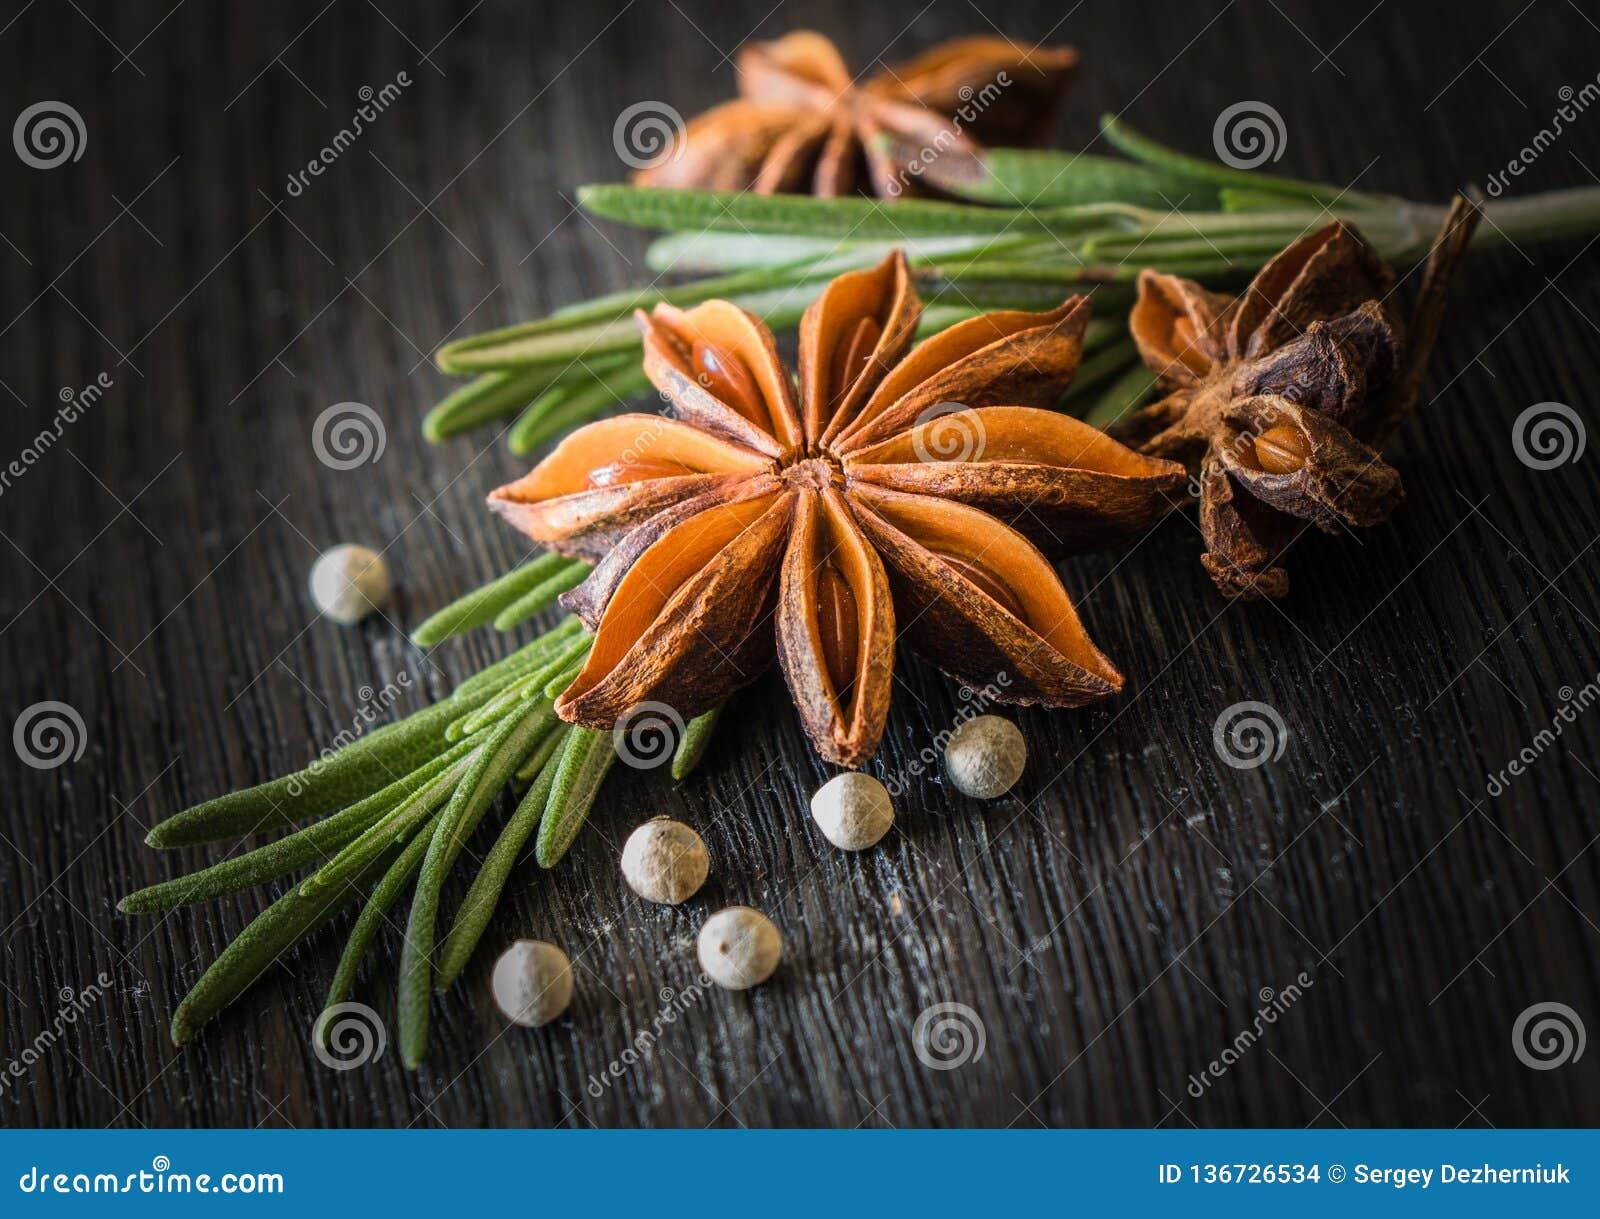 Rosemary, steranijsplant, witte peper